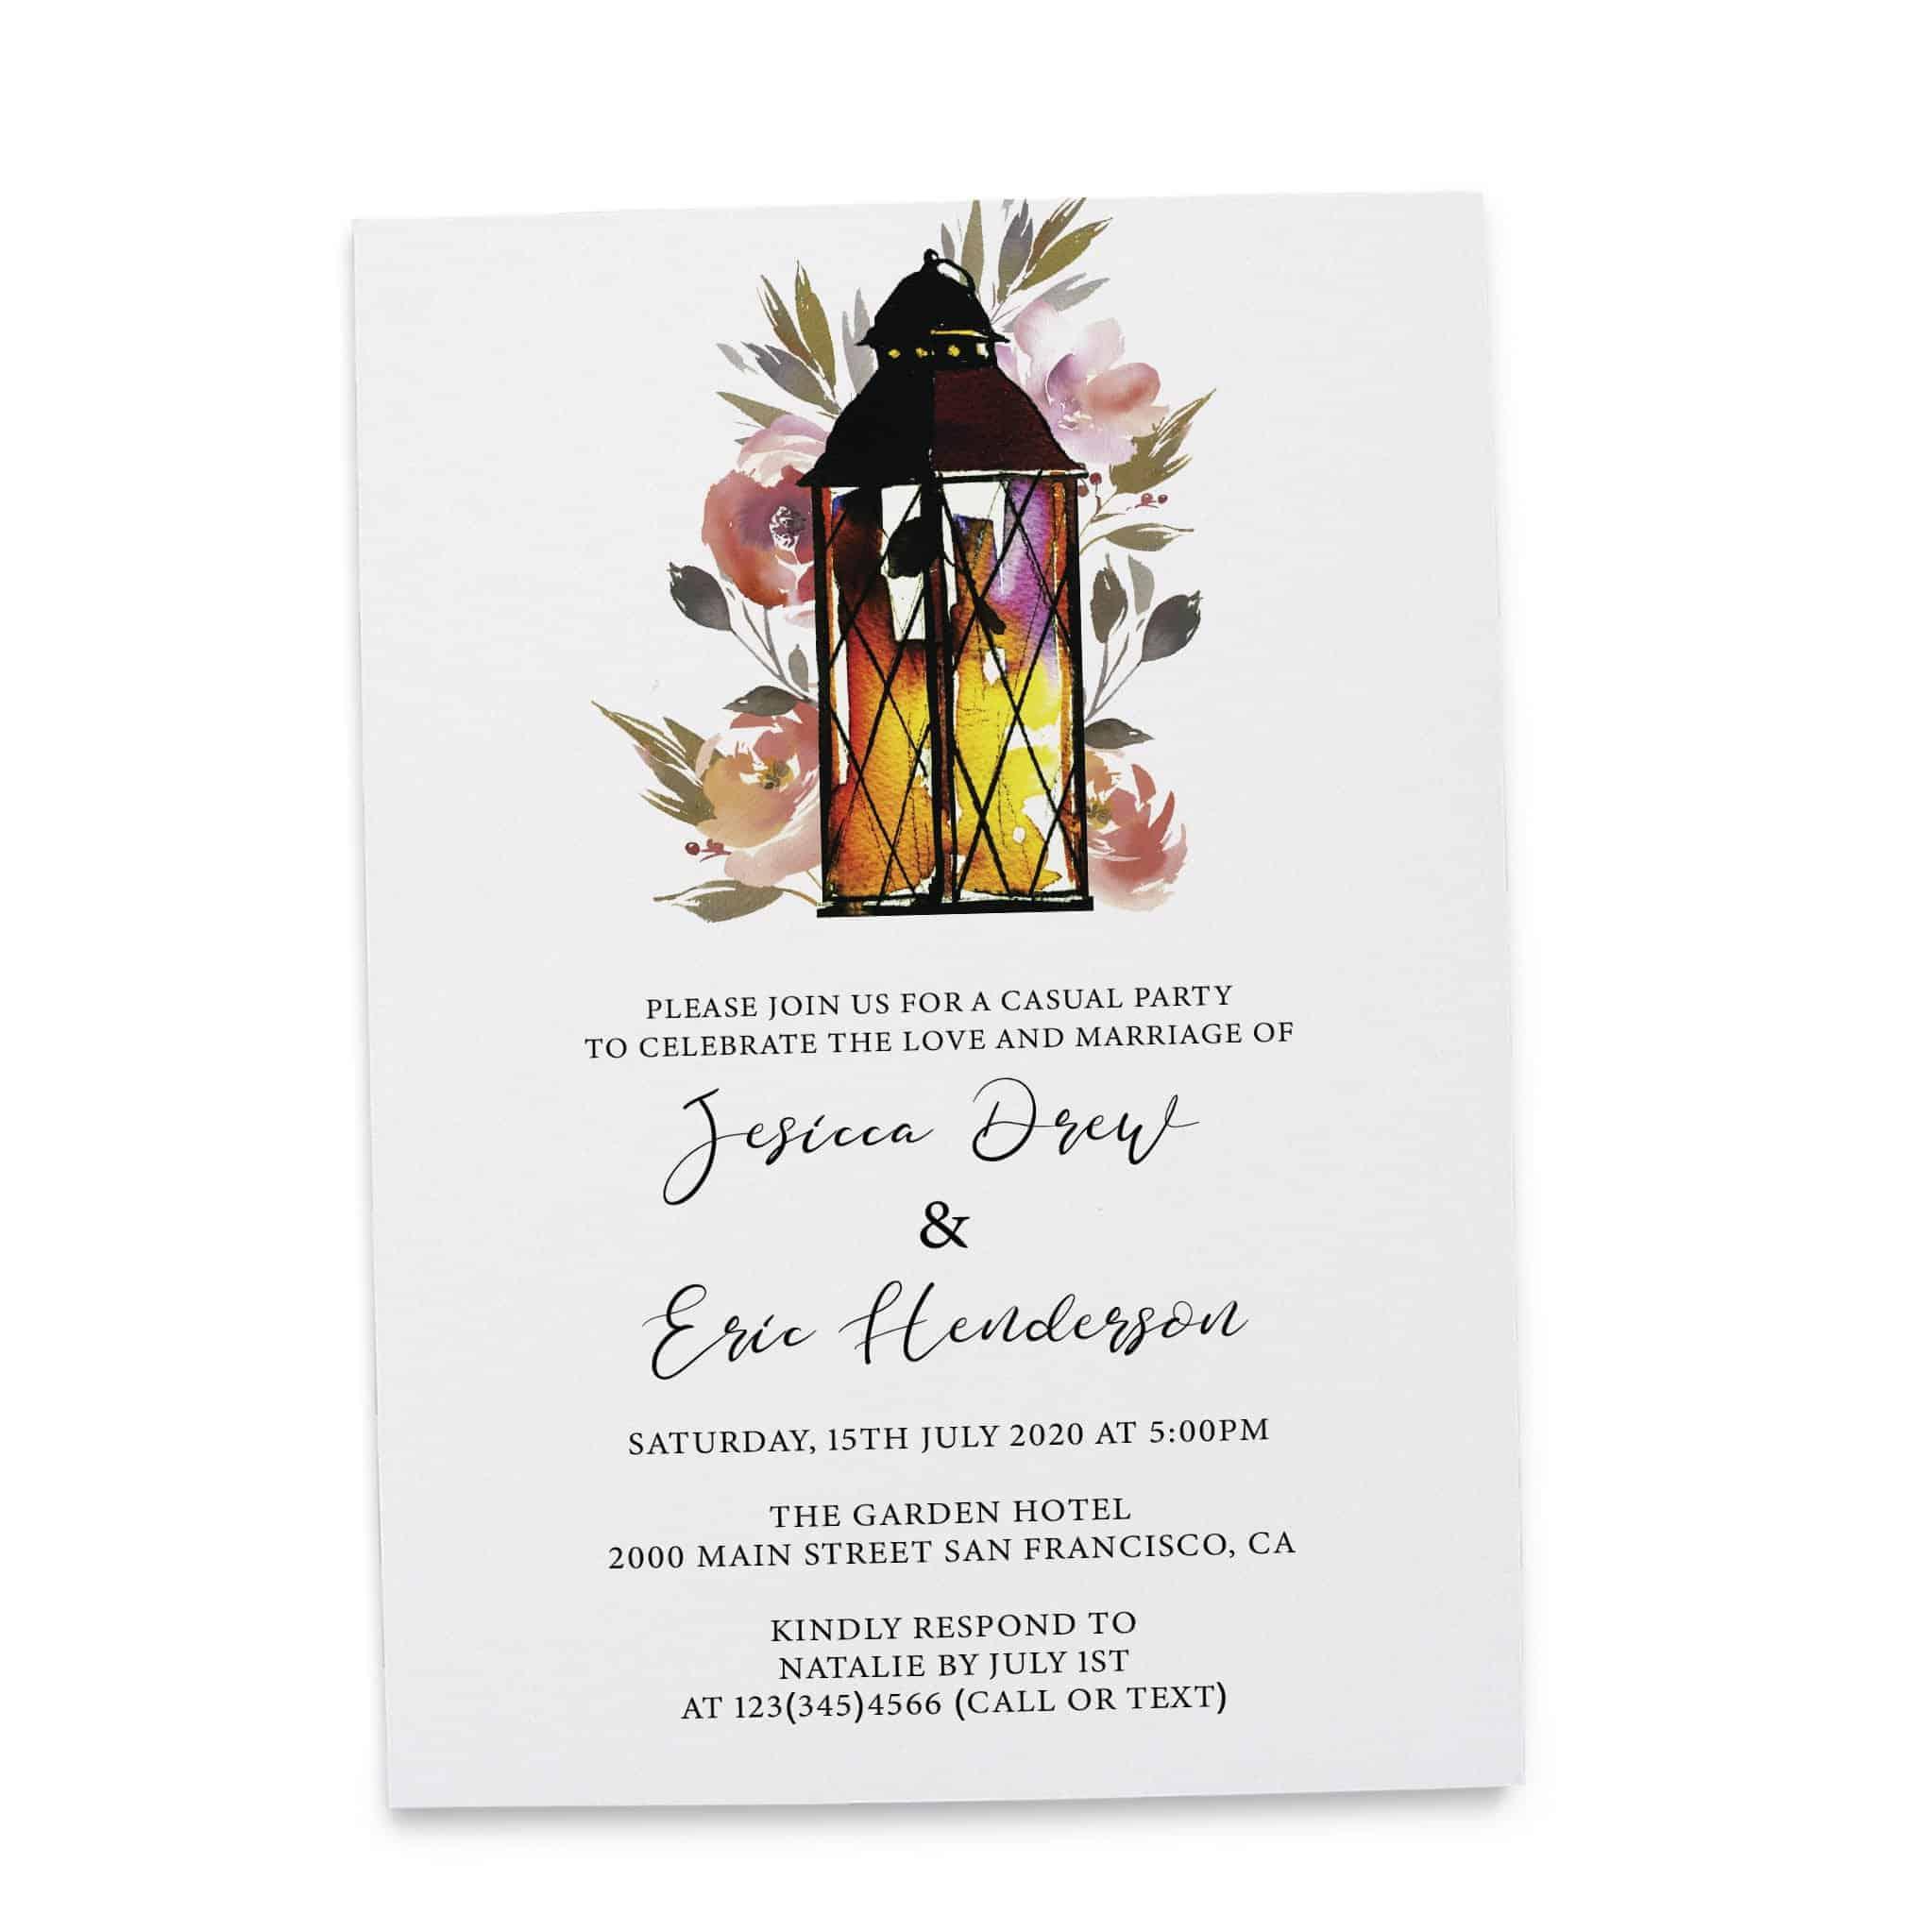 Rustic Elopement Reception Invitation Cards, Wedding Reception Invitations, Floral Invitation Card- Garden Lantern Design elopement273